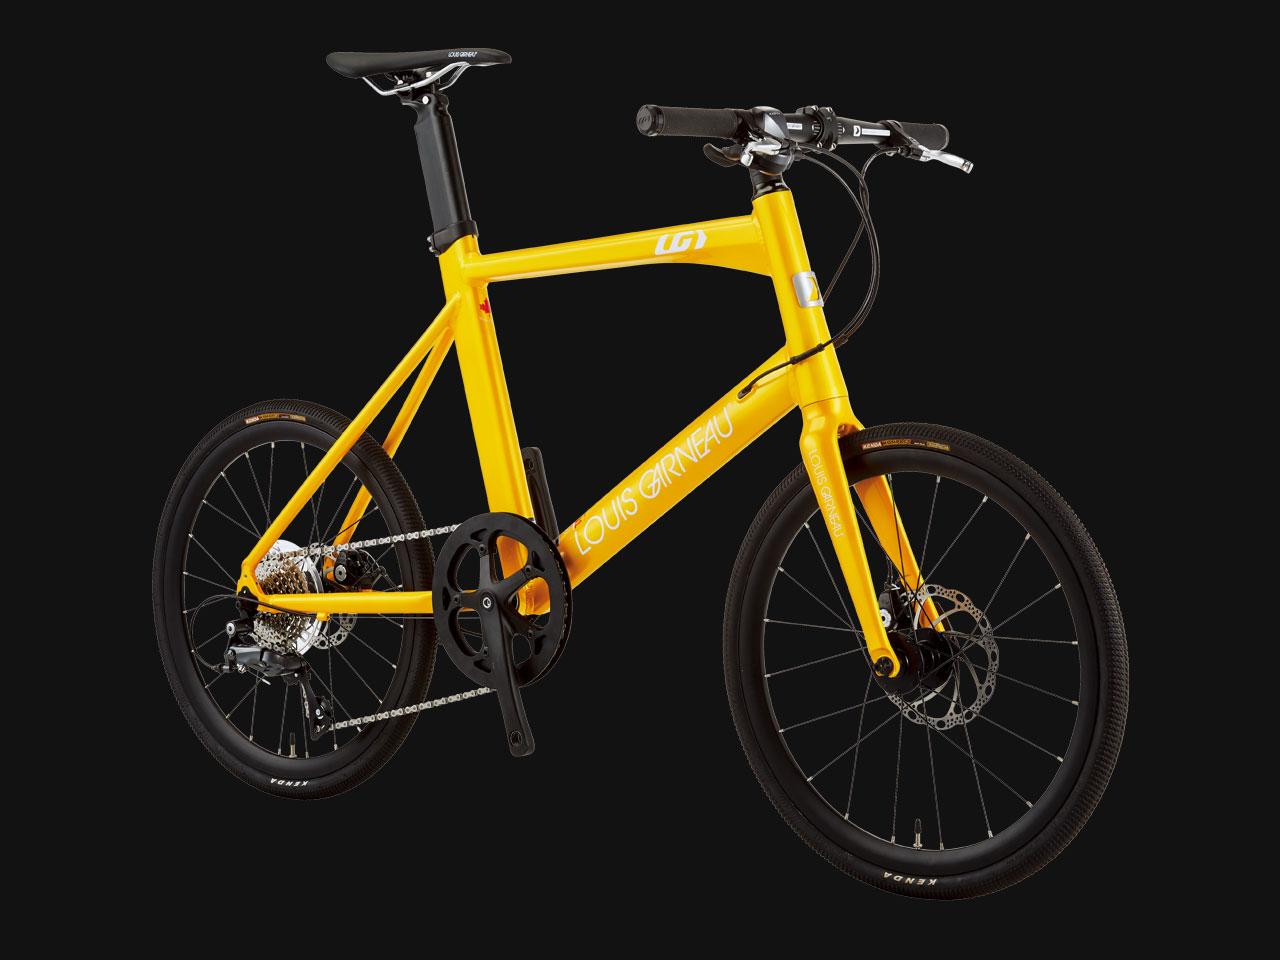 LOUIS GARNEAU ルイガノ EASEL ADVANED 3 SUNSHINE YELLOW  小径自転車 ミニベロ